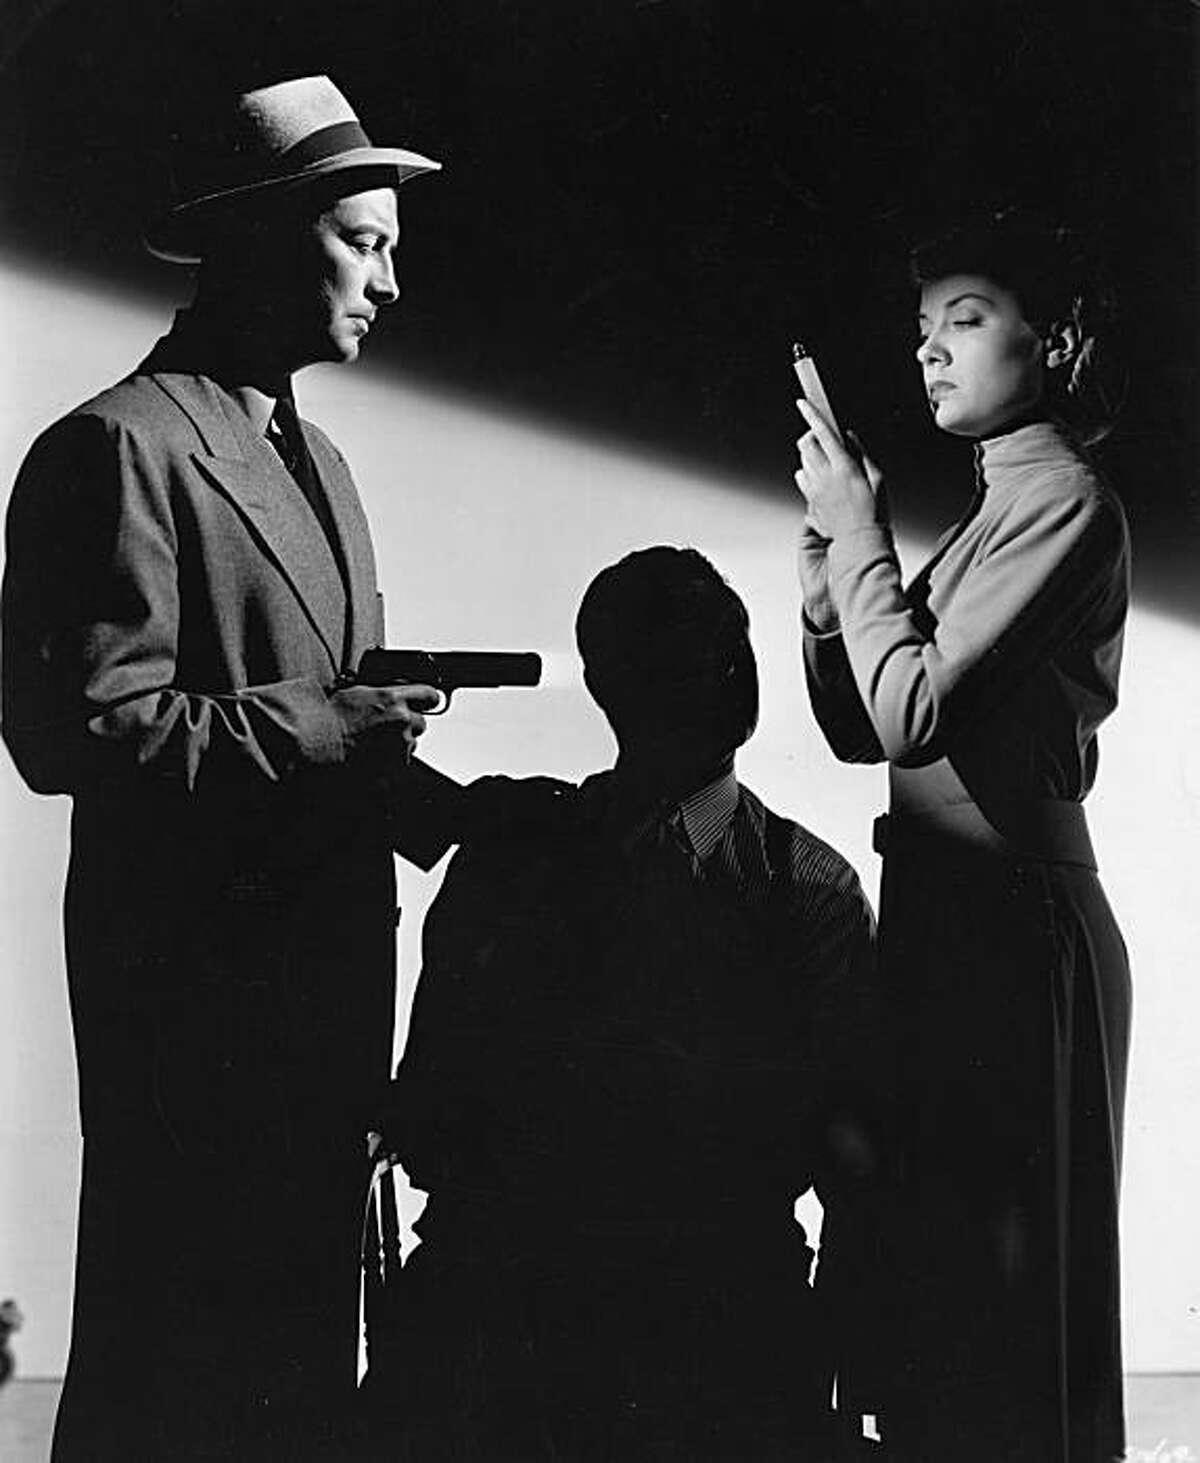 Robert Taylor (left) and Audrey Totter in Curtis Bernhardt's 1947 film noir,